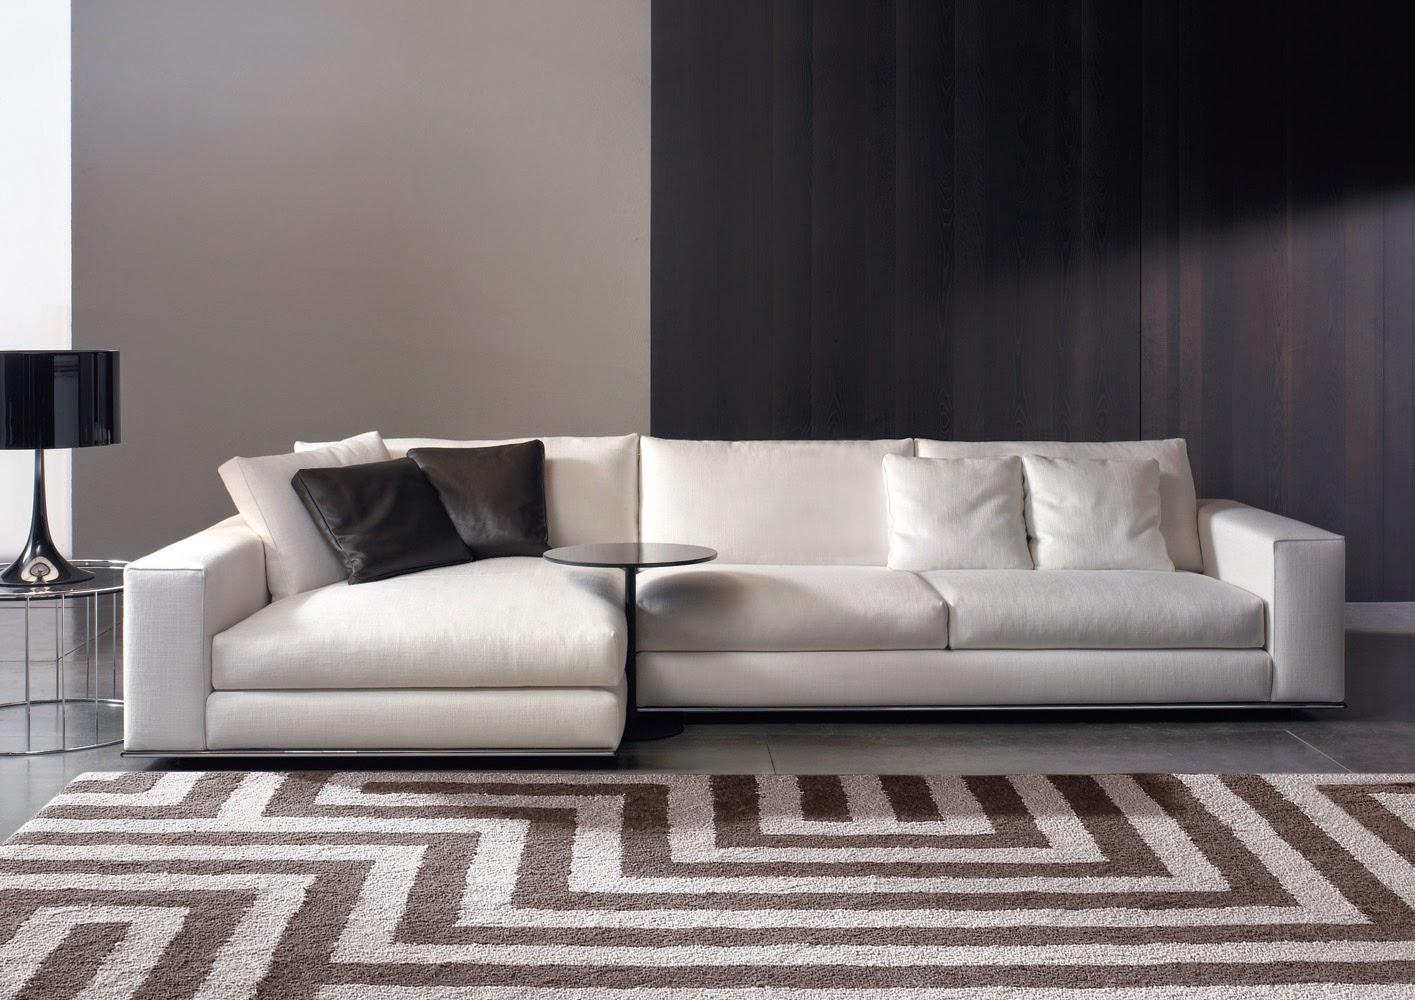 Harga Sofa Minimalis Untuk Ruang Tamu Kecil 2017 Modern Murah